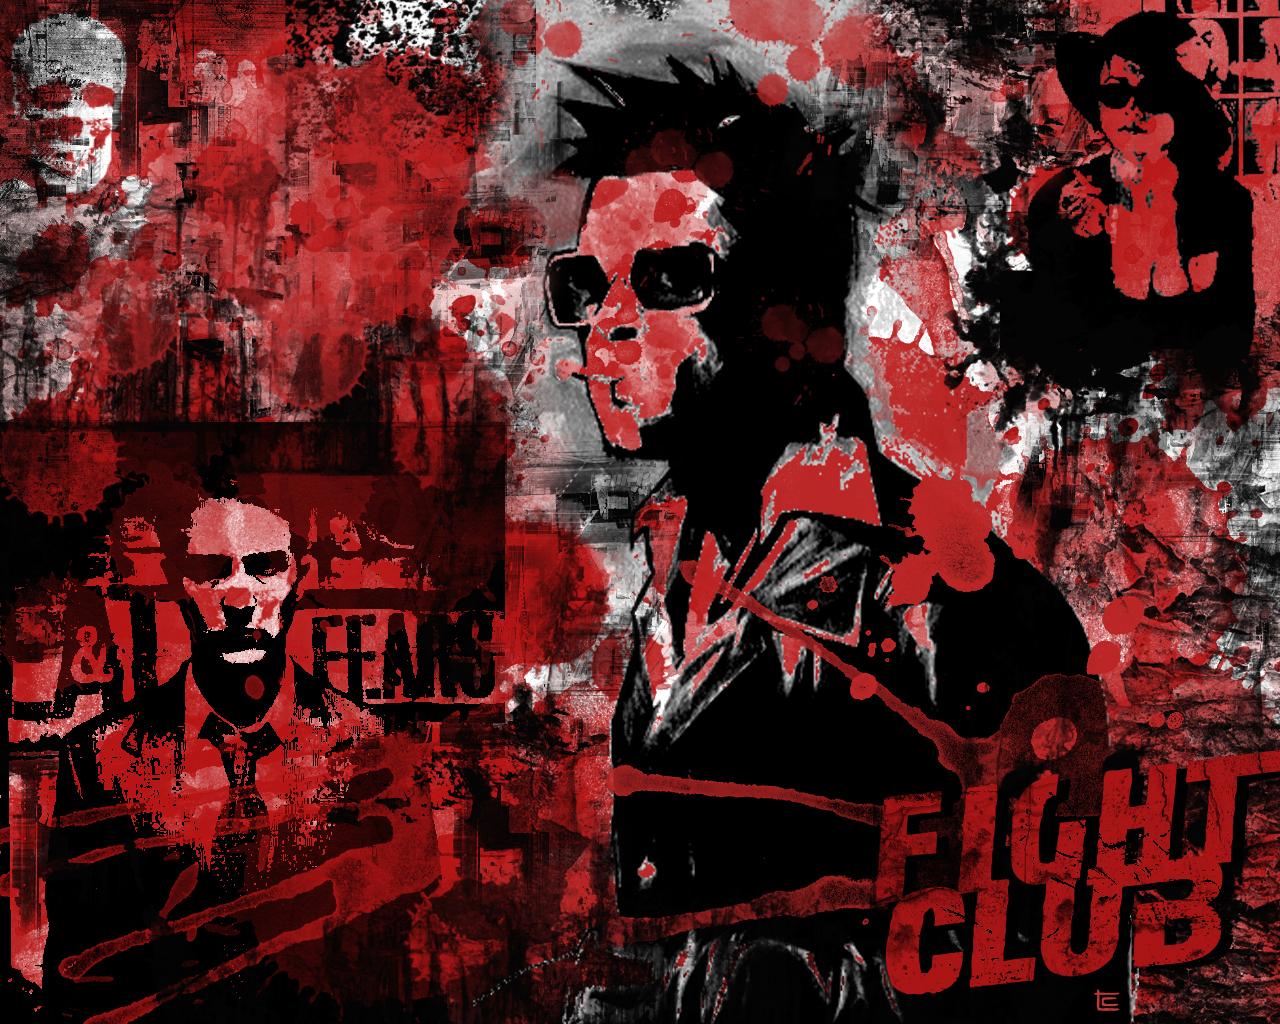 Fight Club Computer Wallpapers Desktop Backgrounds 1280x1024